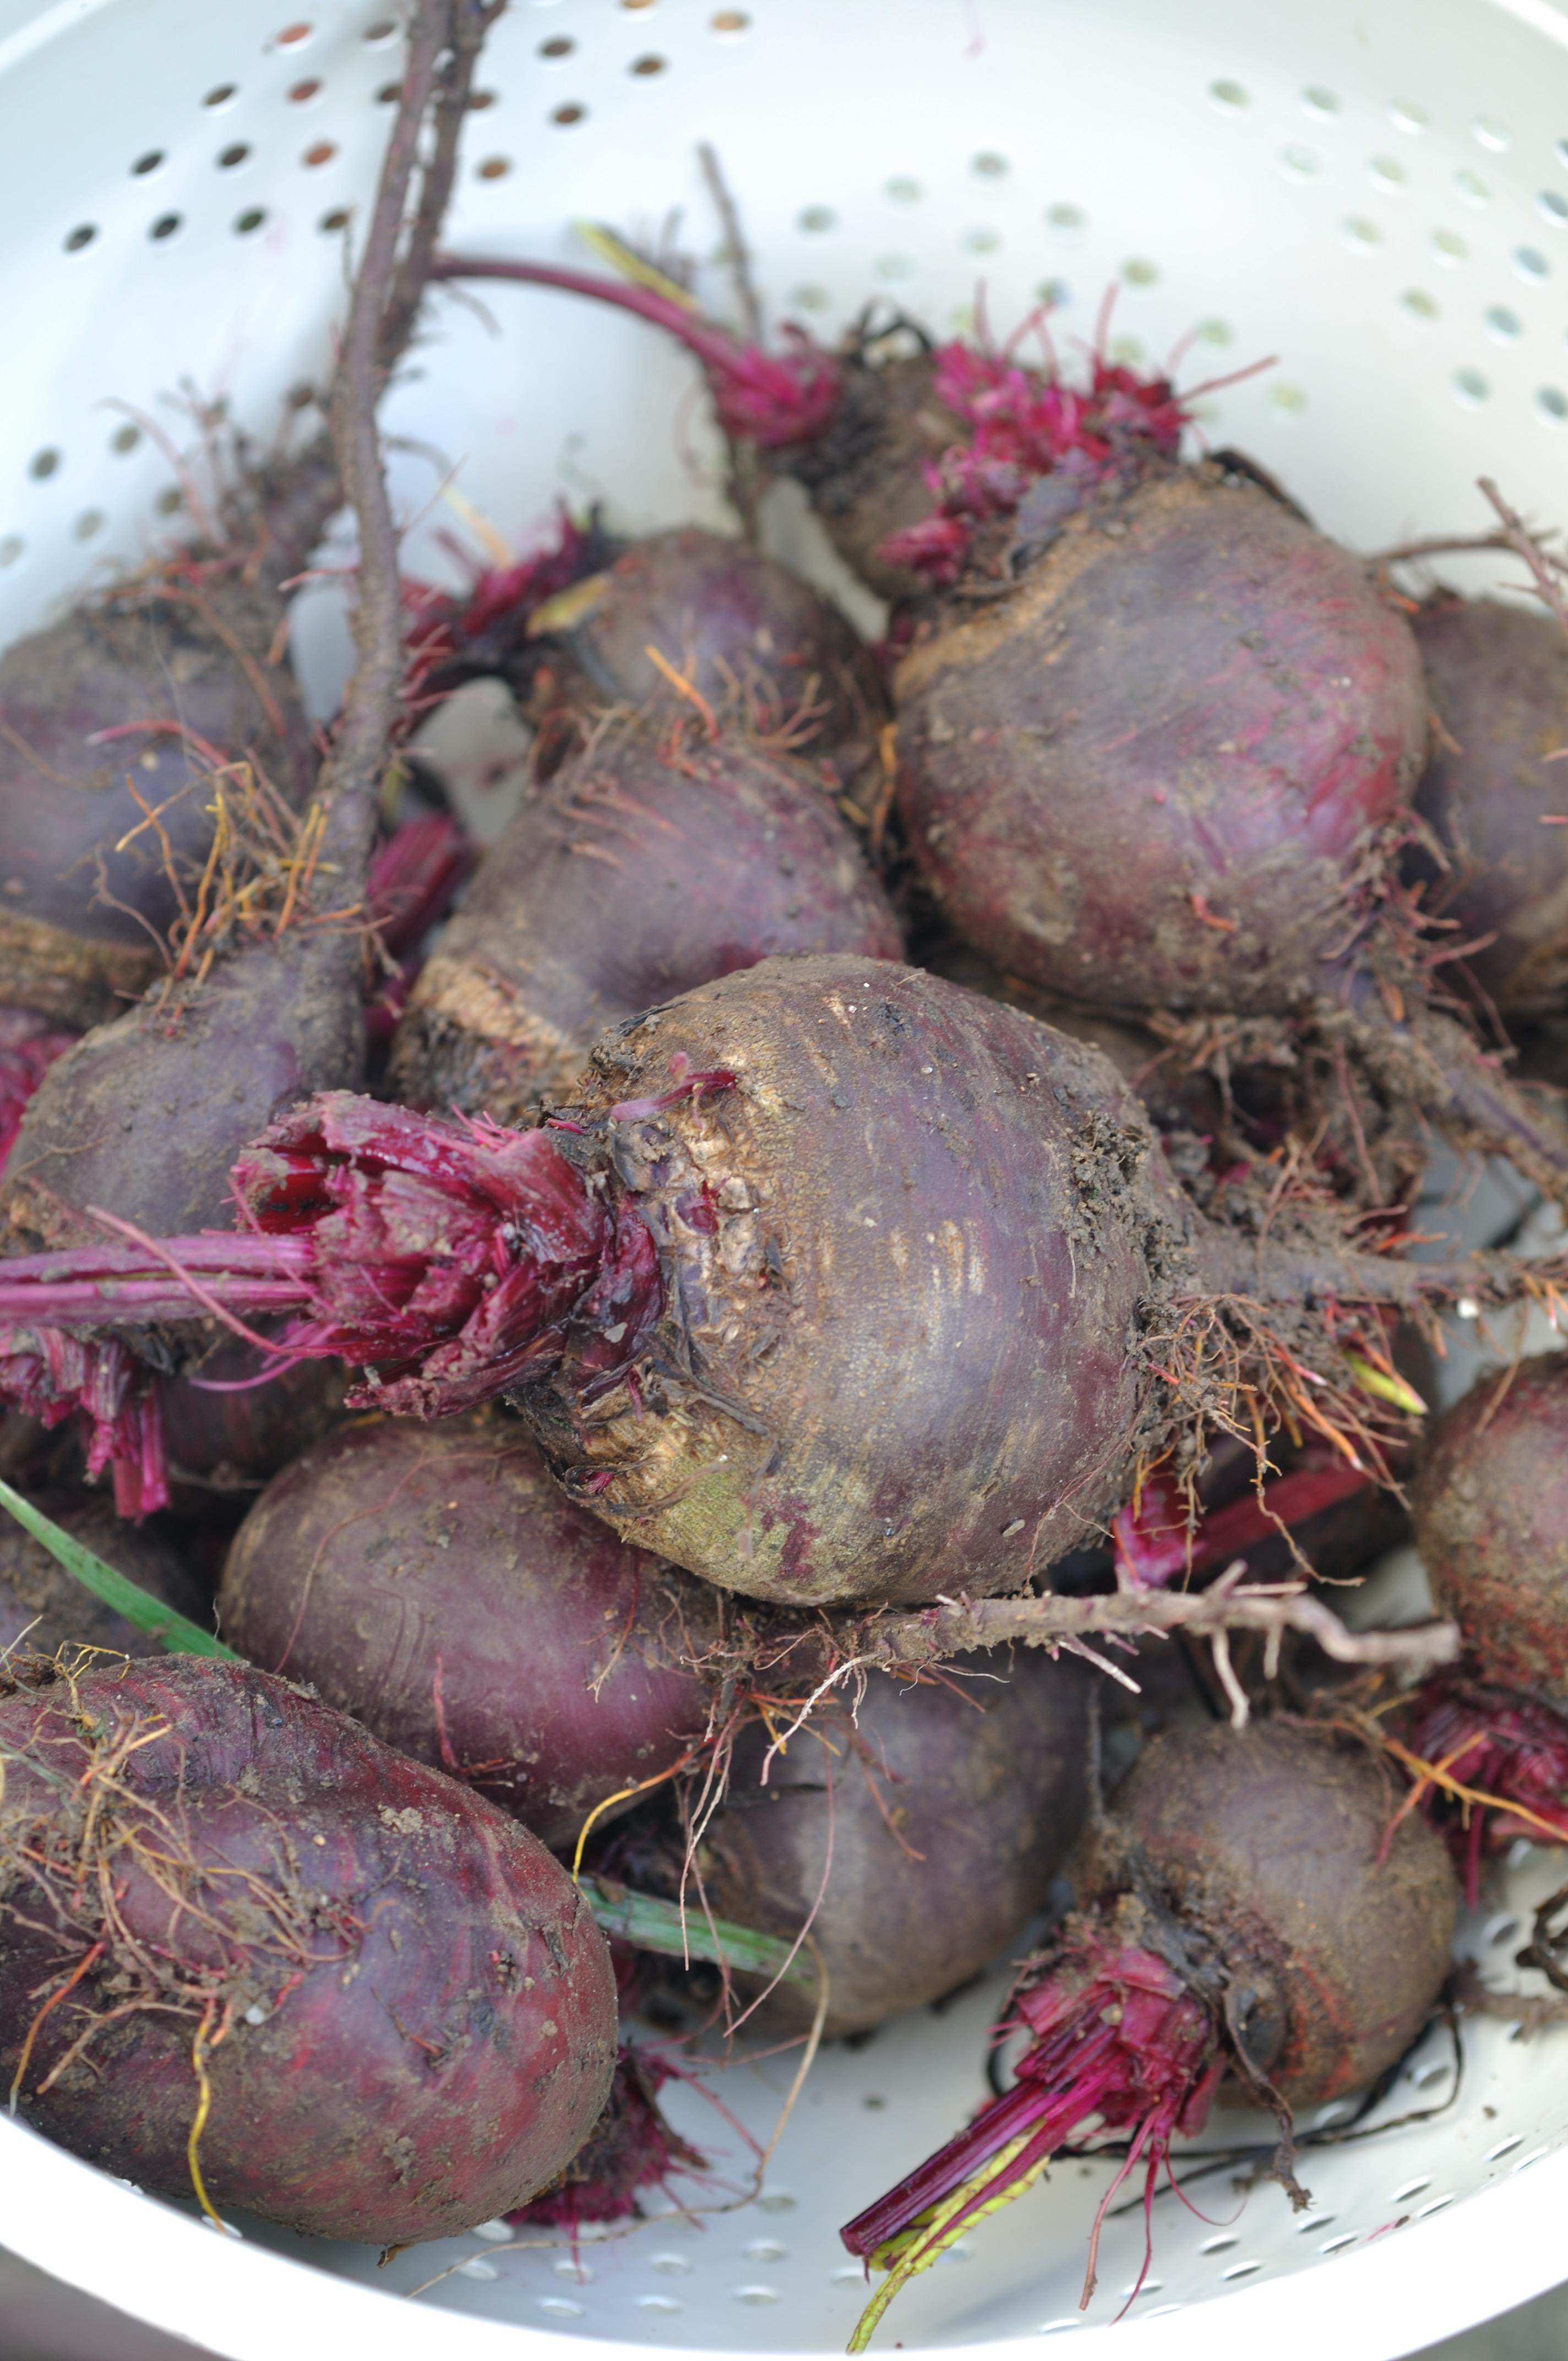 Beetroot harvest